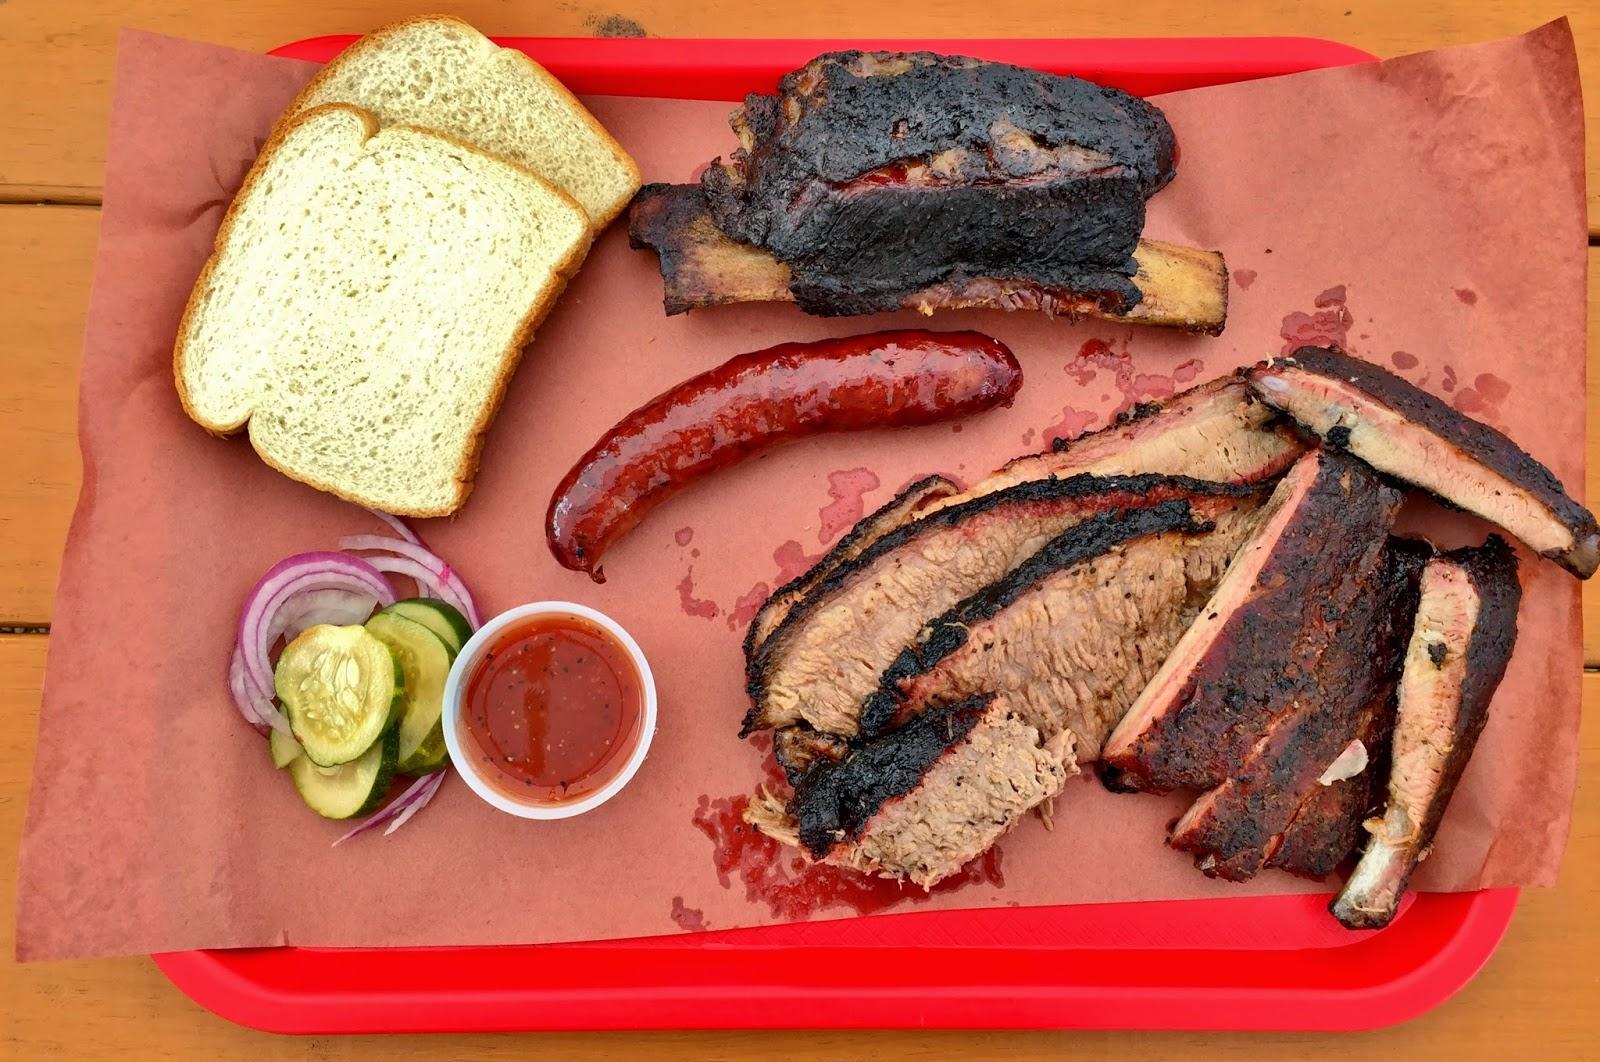 A spread of meats from Kerlin BBQ in East Austin